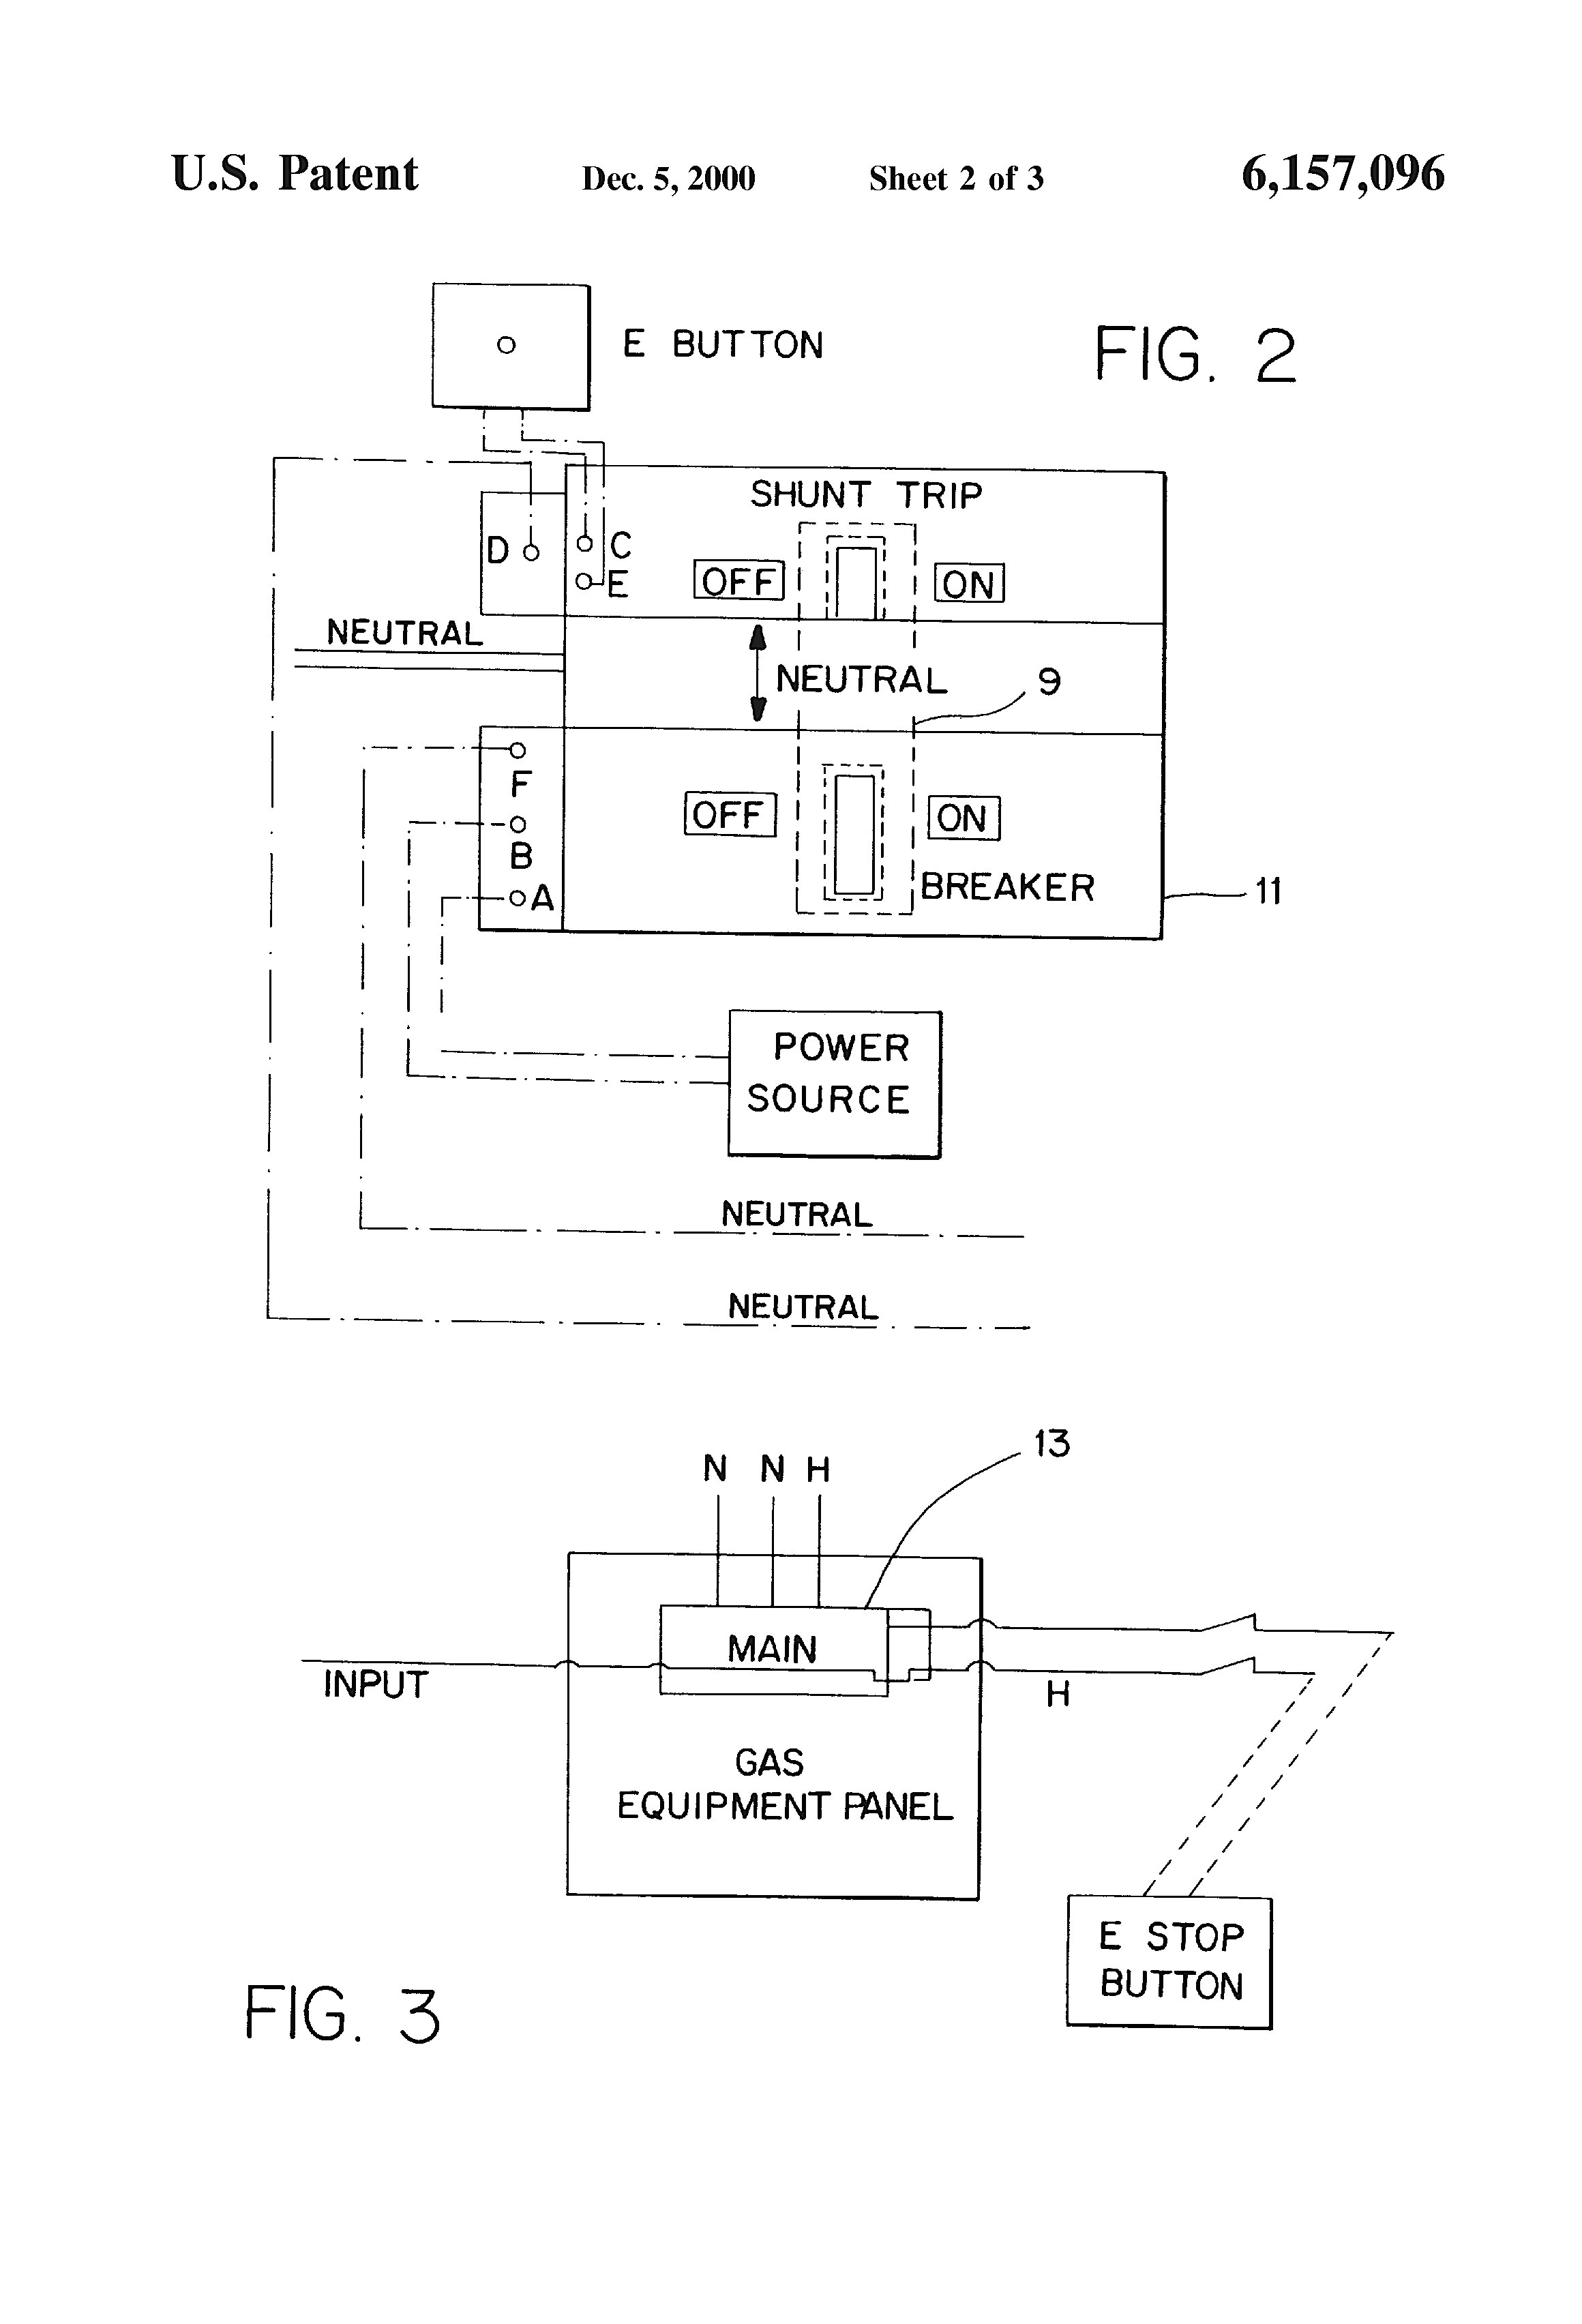 Ansul R 102 Wiring Diagram   Wiring Library - Ansul System Wiring Diagram